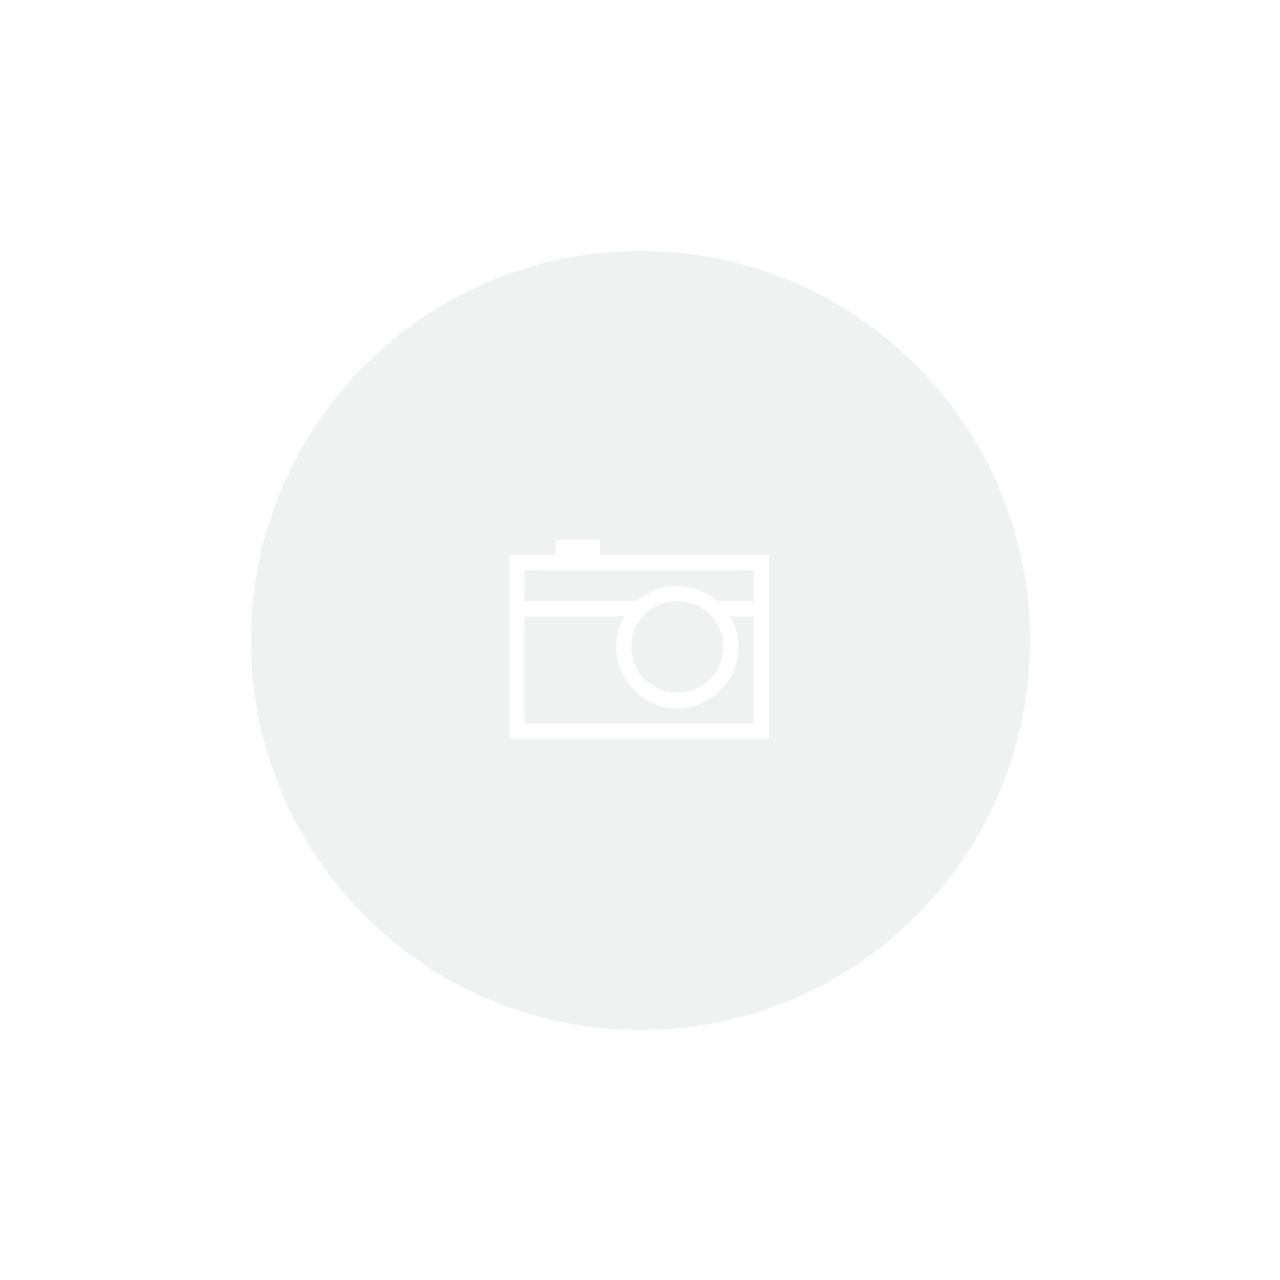 Bandeja Oval Latao Niquelado 56x39x12cm